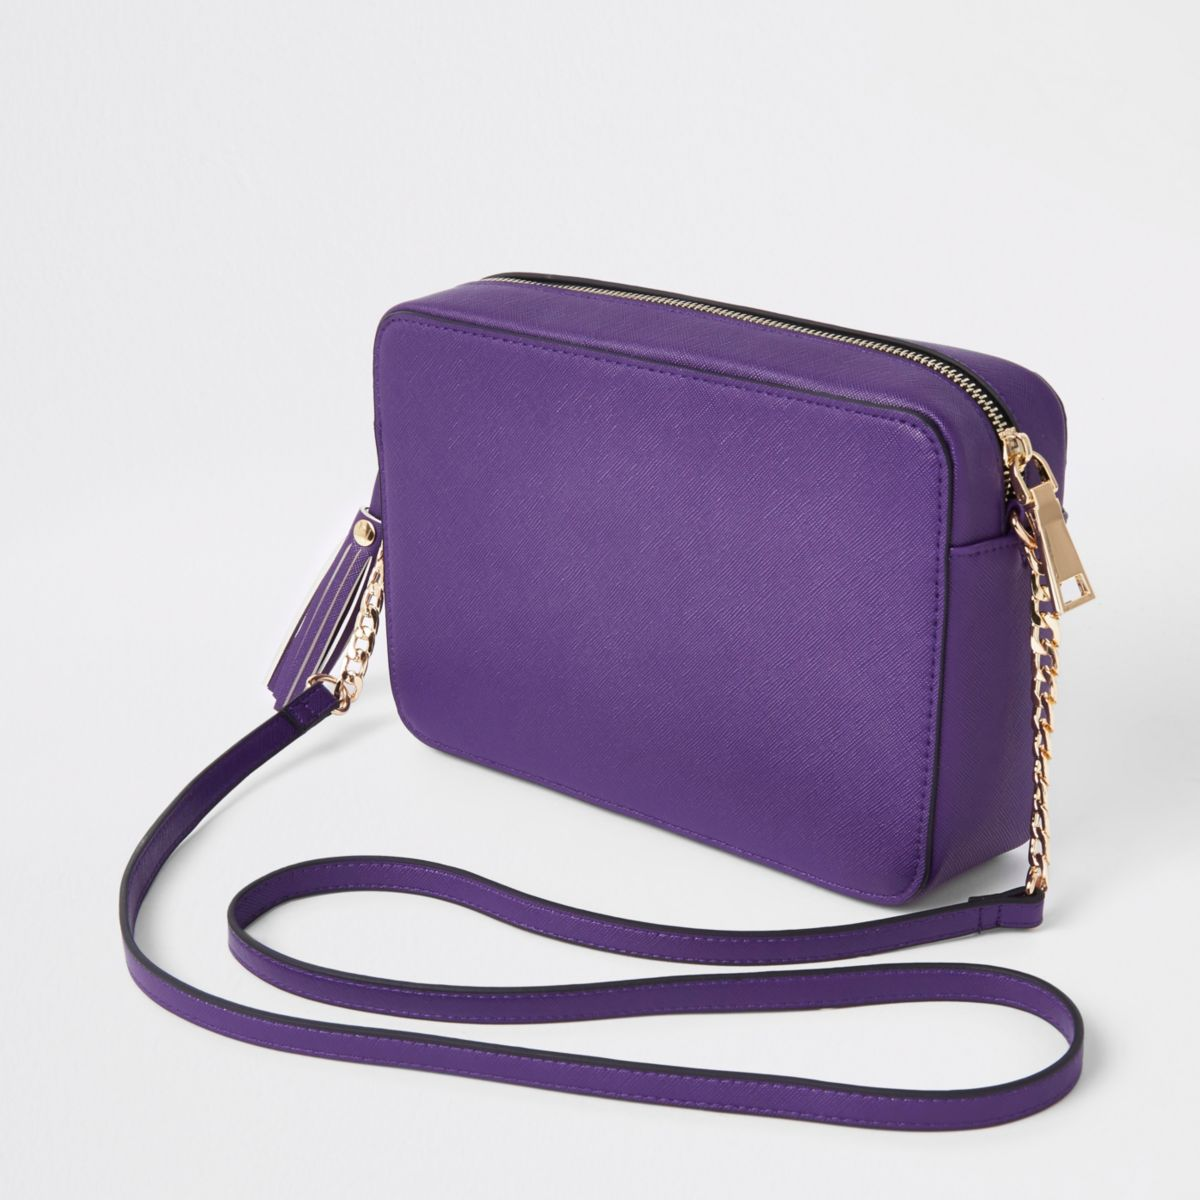 body tassel boxy cross Purple bag YXzWt7qzw